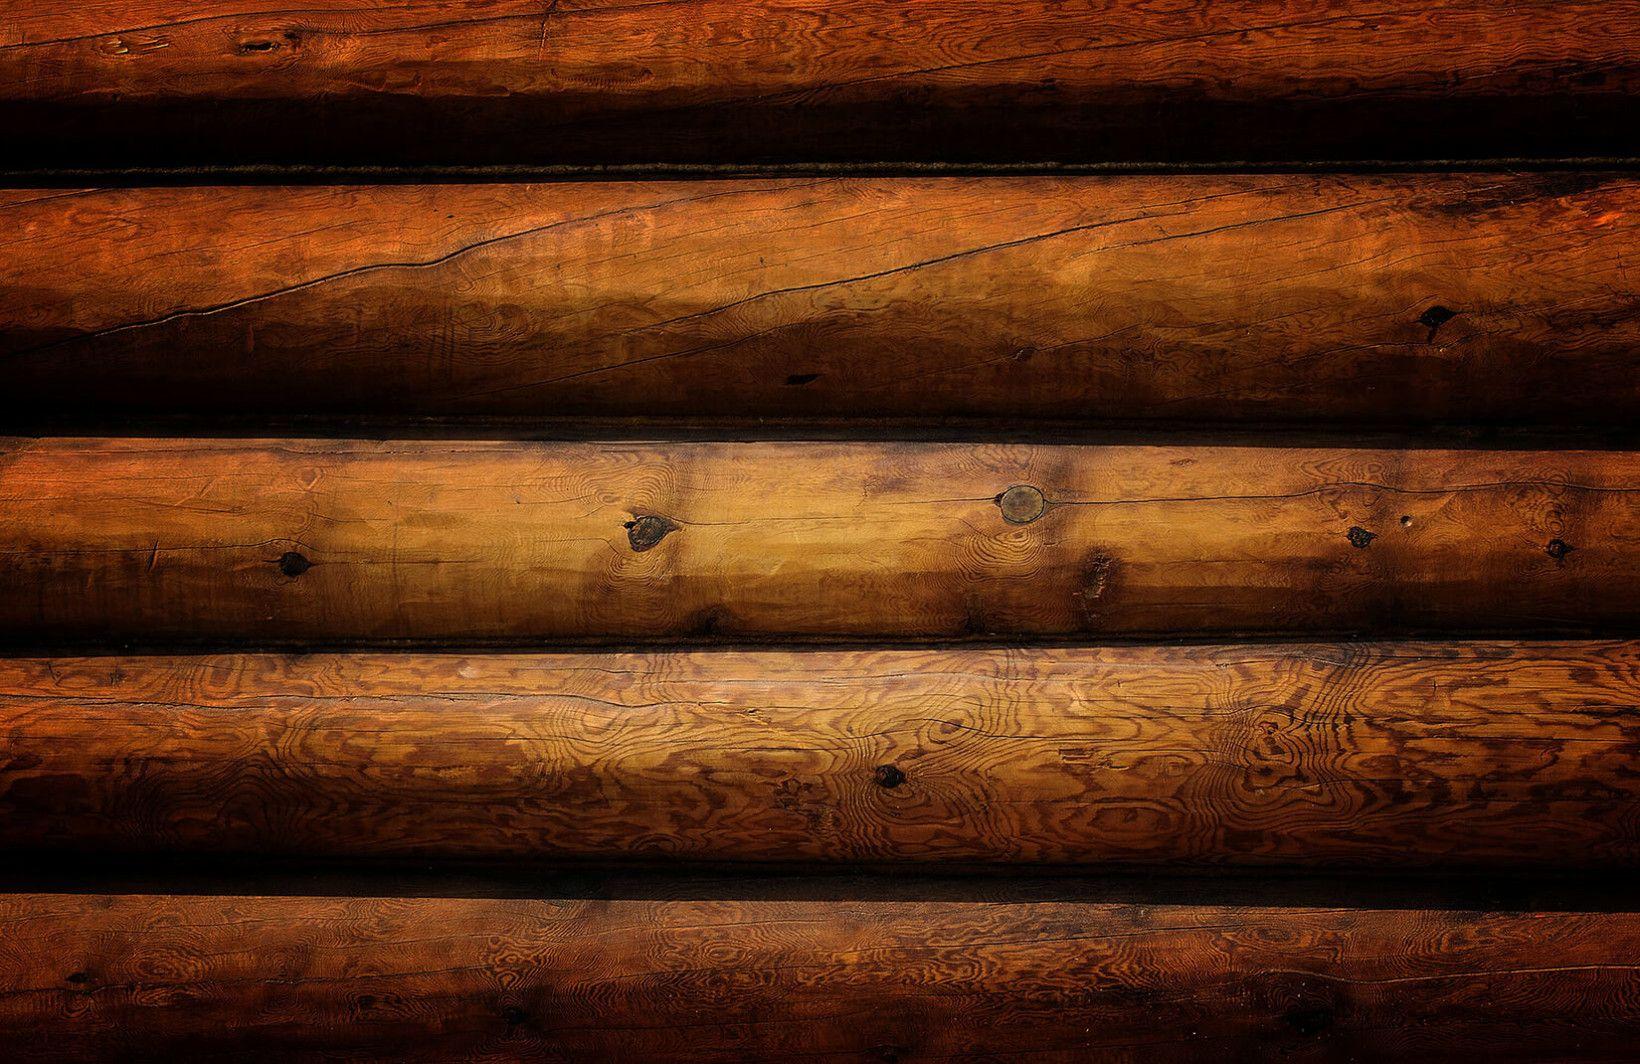 Wood Wallpaper Wooden Wallpaper Murals Wallpaper Wooden Wallpaper Log Cabin Rustic Cabins In The Woods